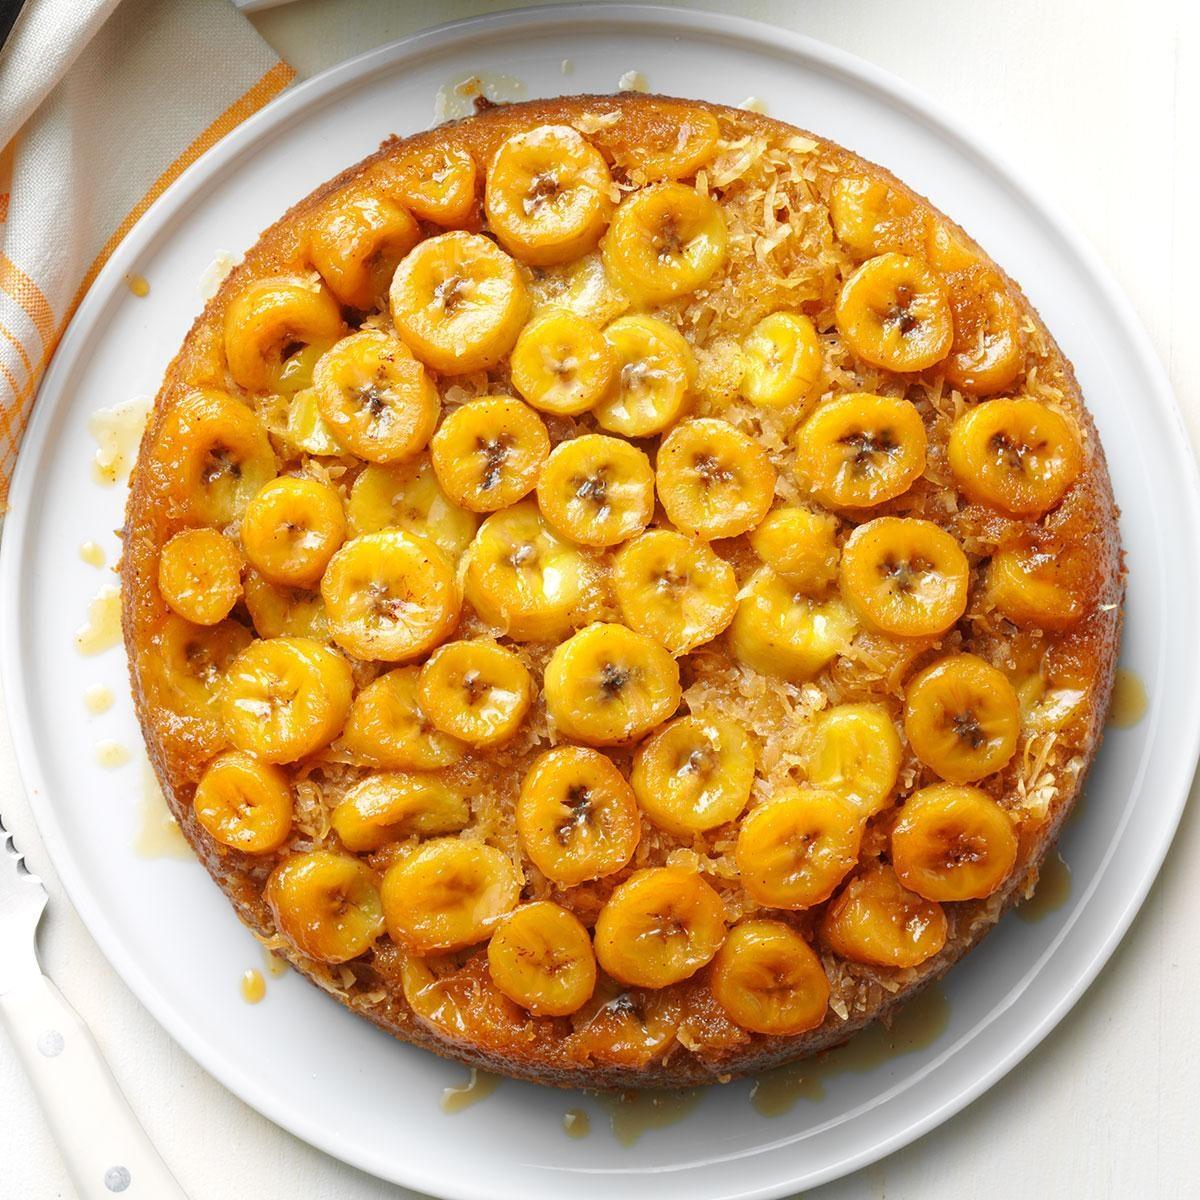 Tennessee: Banana Skillet Upside-Down Cake